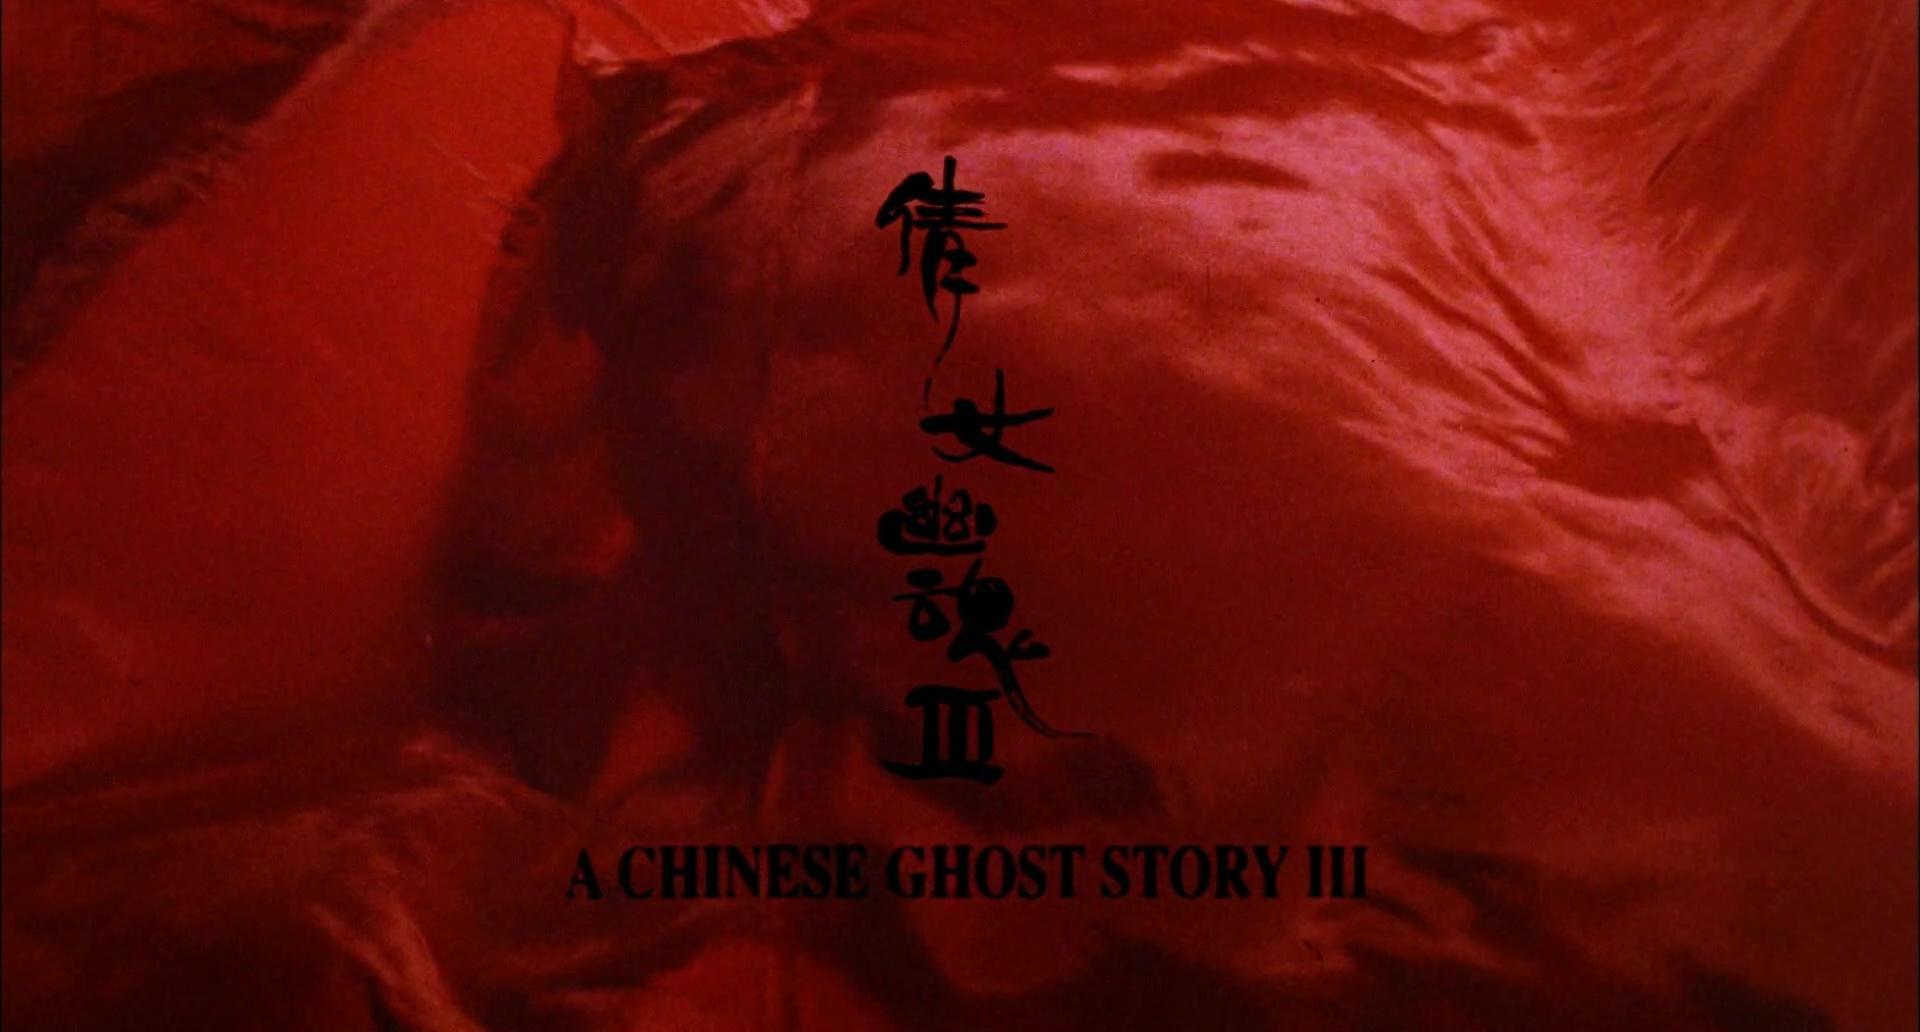 HISTOIRES DE FANTÔMES CHINOIS 3 (倩女幽魂III:道道道) de Ching Siu Tung (1991)